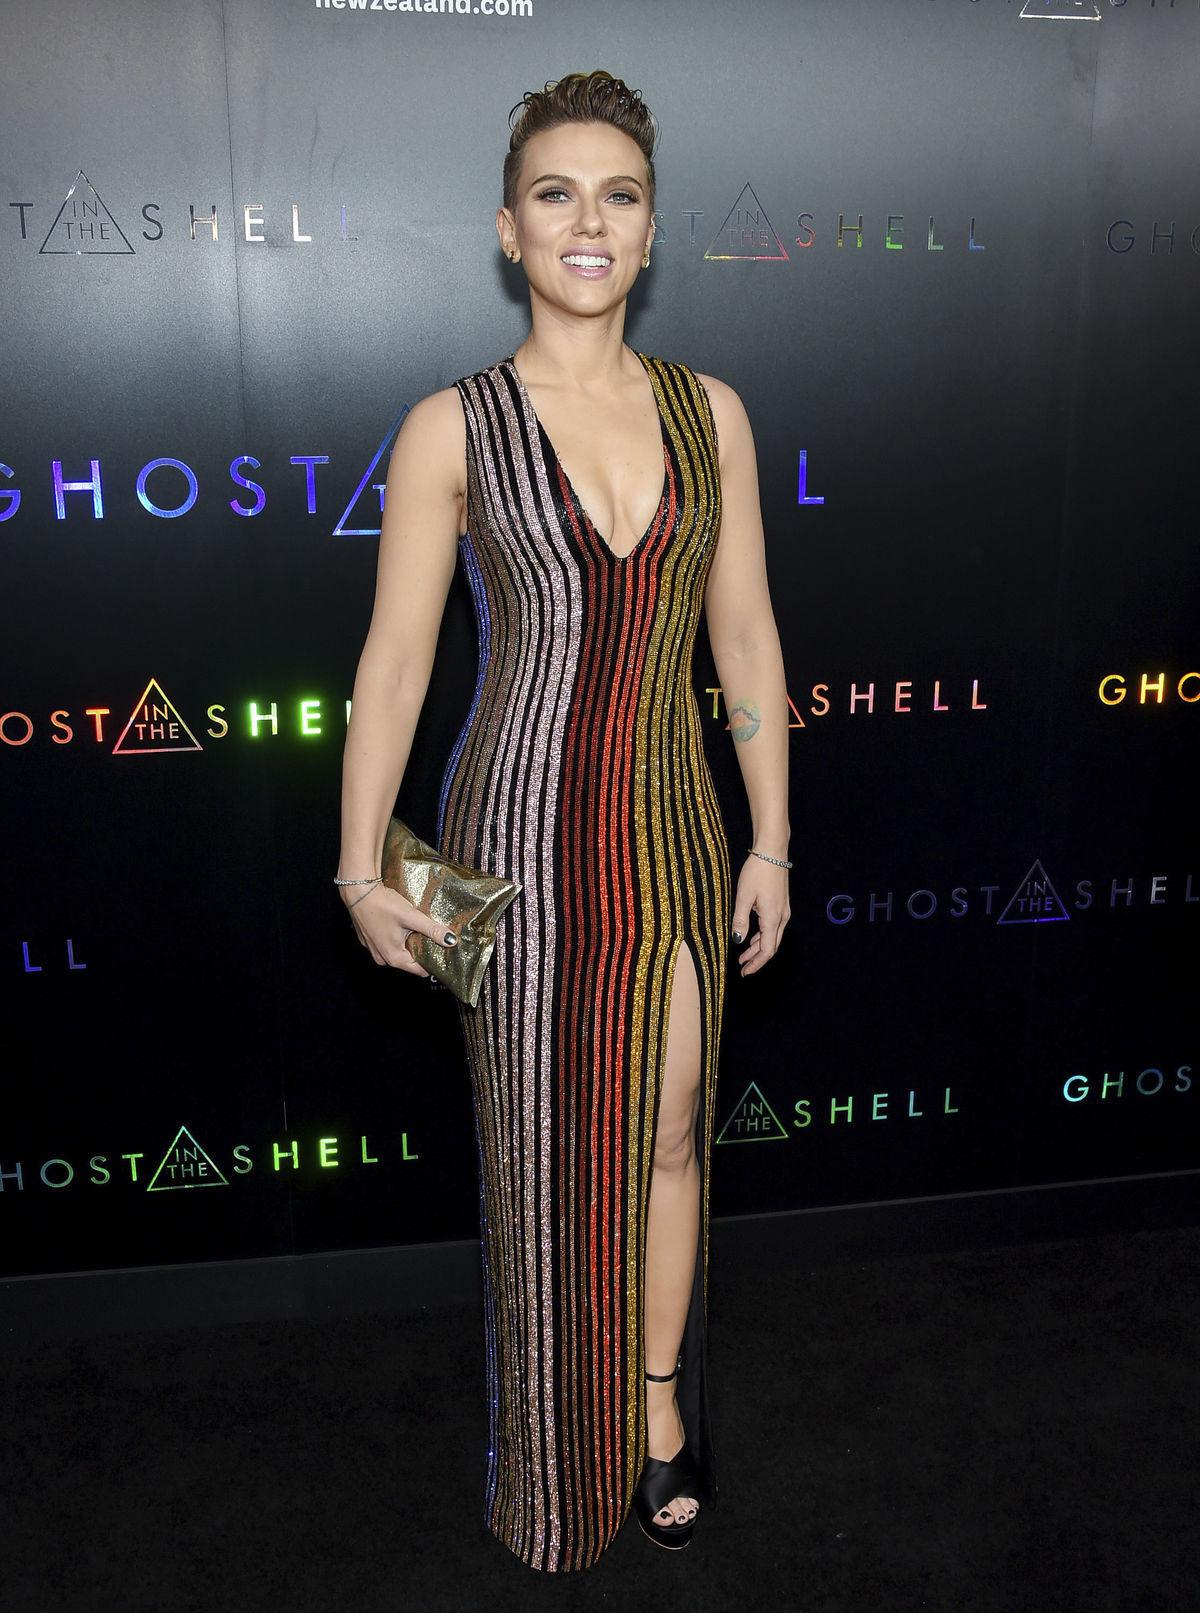 Scarlett Johansson: 10 φορές που η γοητεία της ήταν αφοπλιστική - Queen.gr